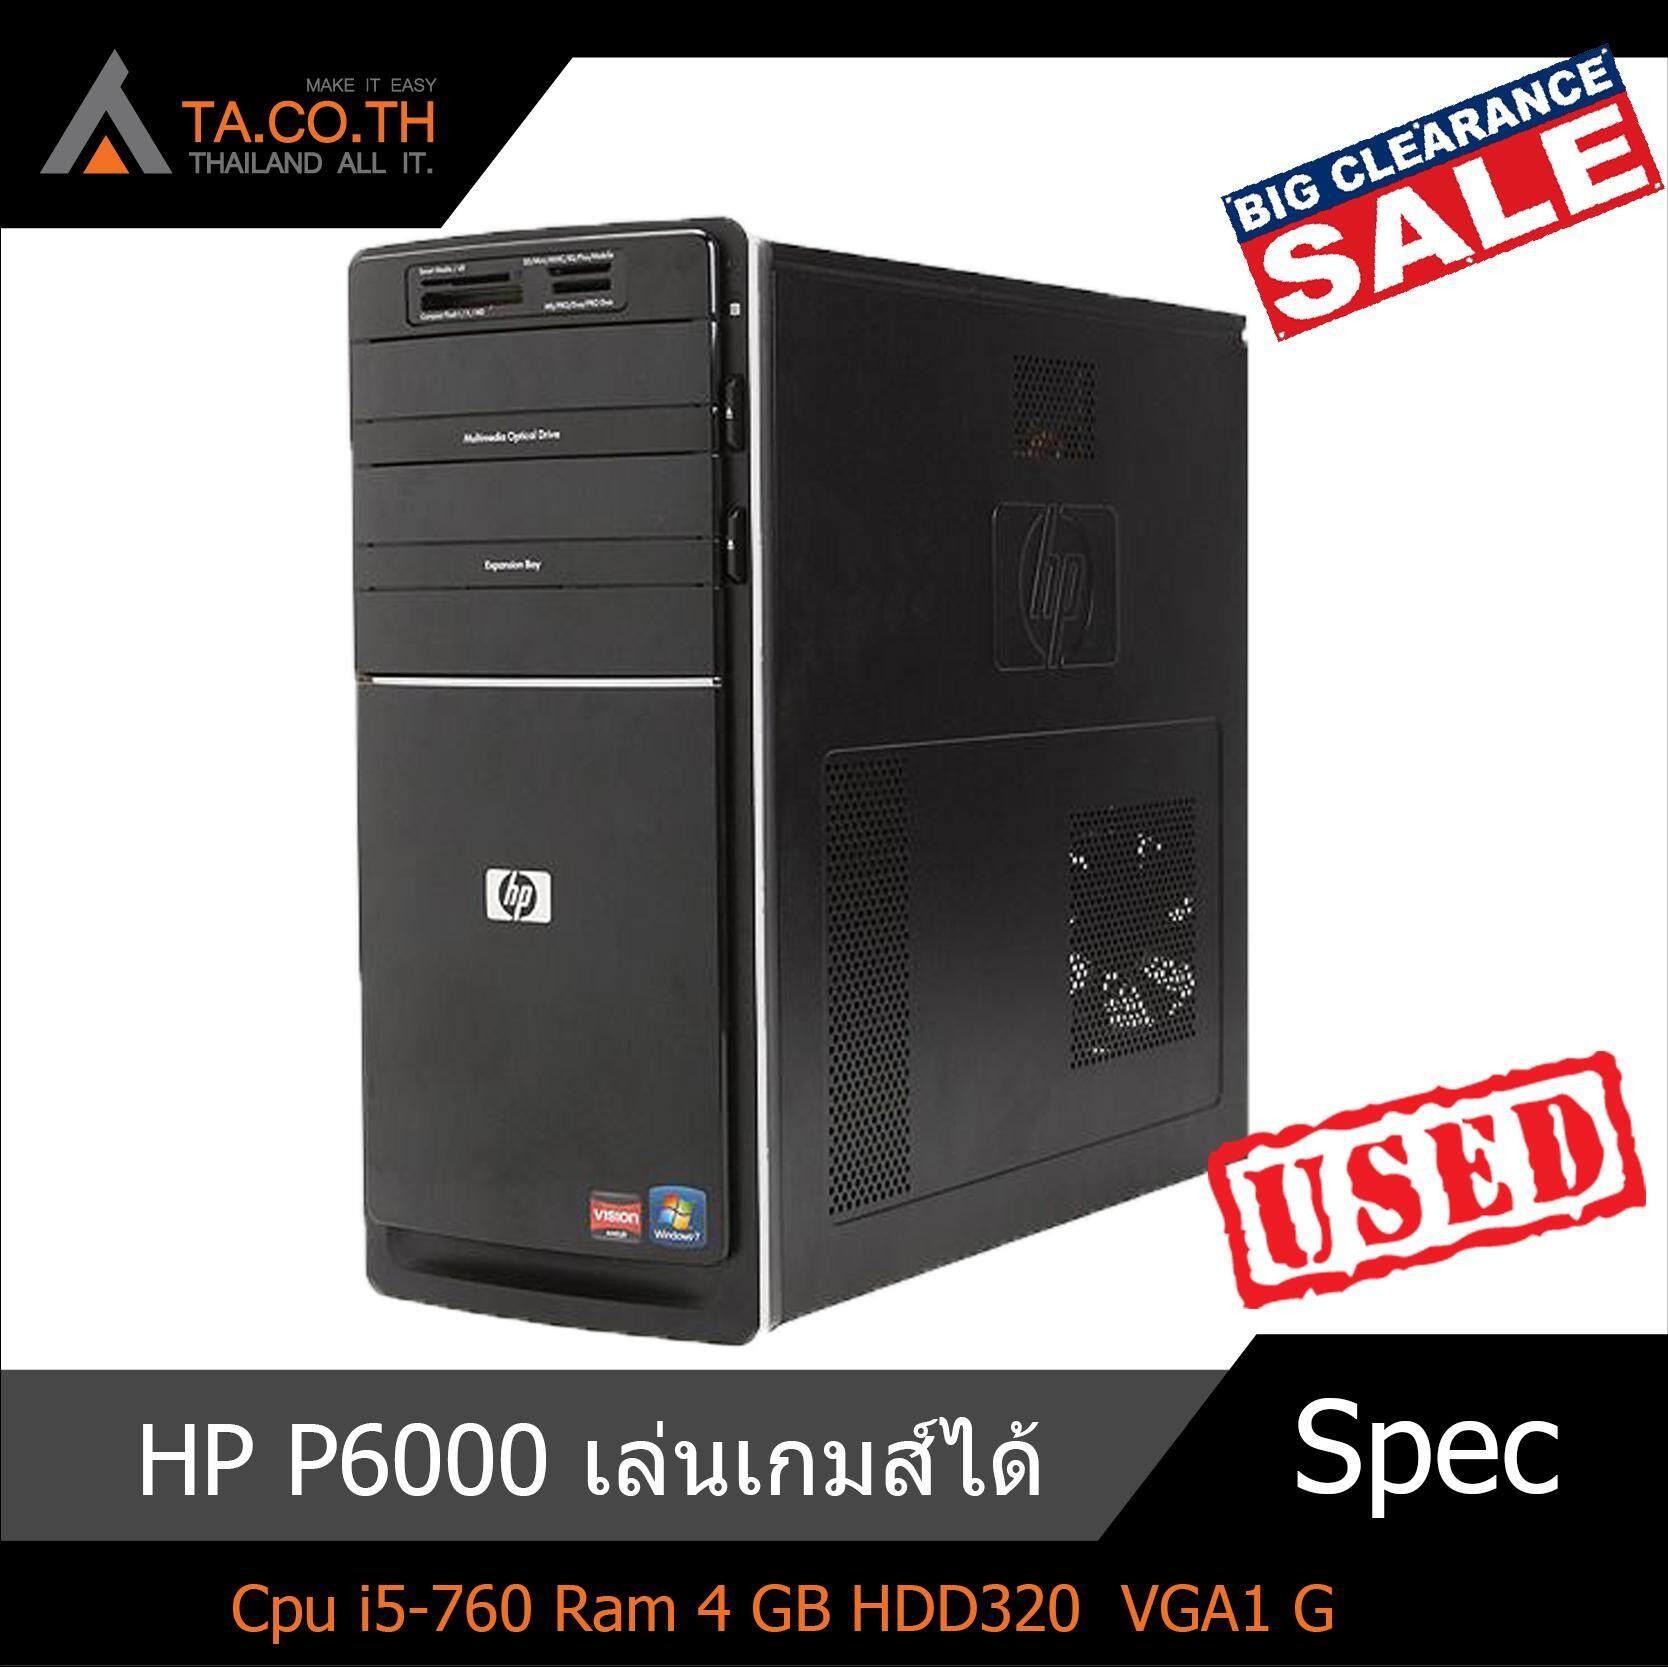 Computer HP P6000 เล่นเกมส์ได้